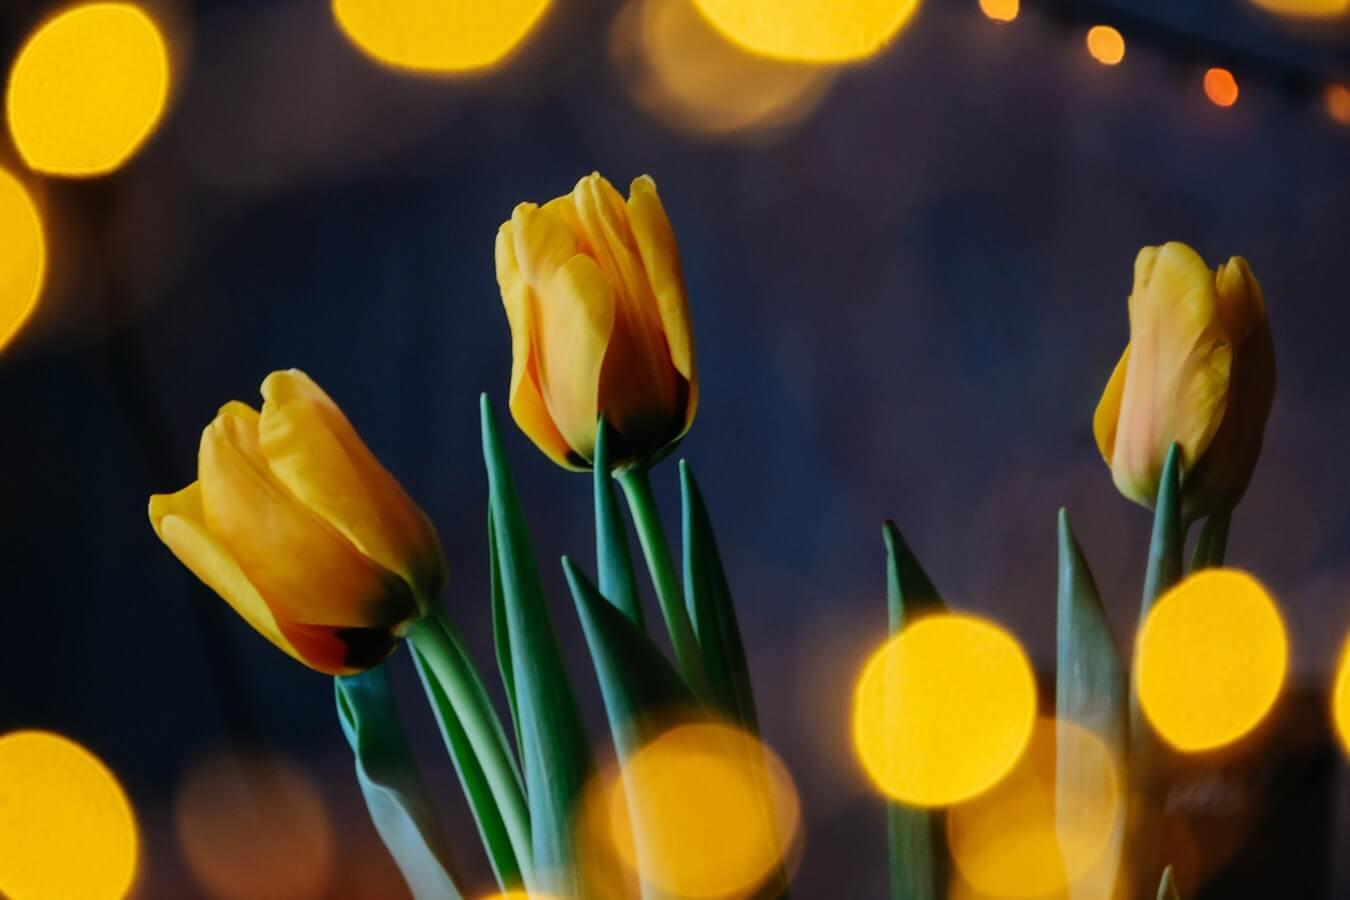 OBI & OTRADI March 2019 Newsletter